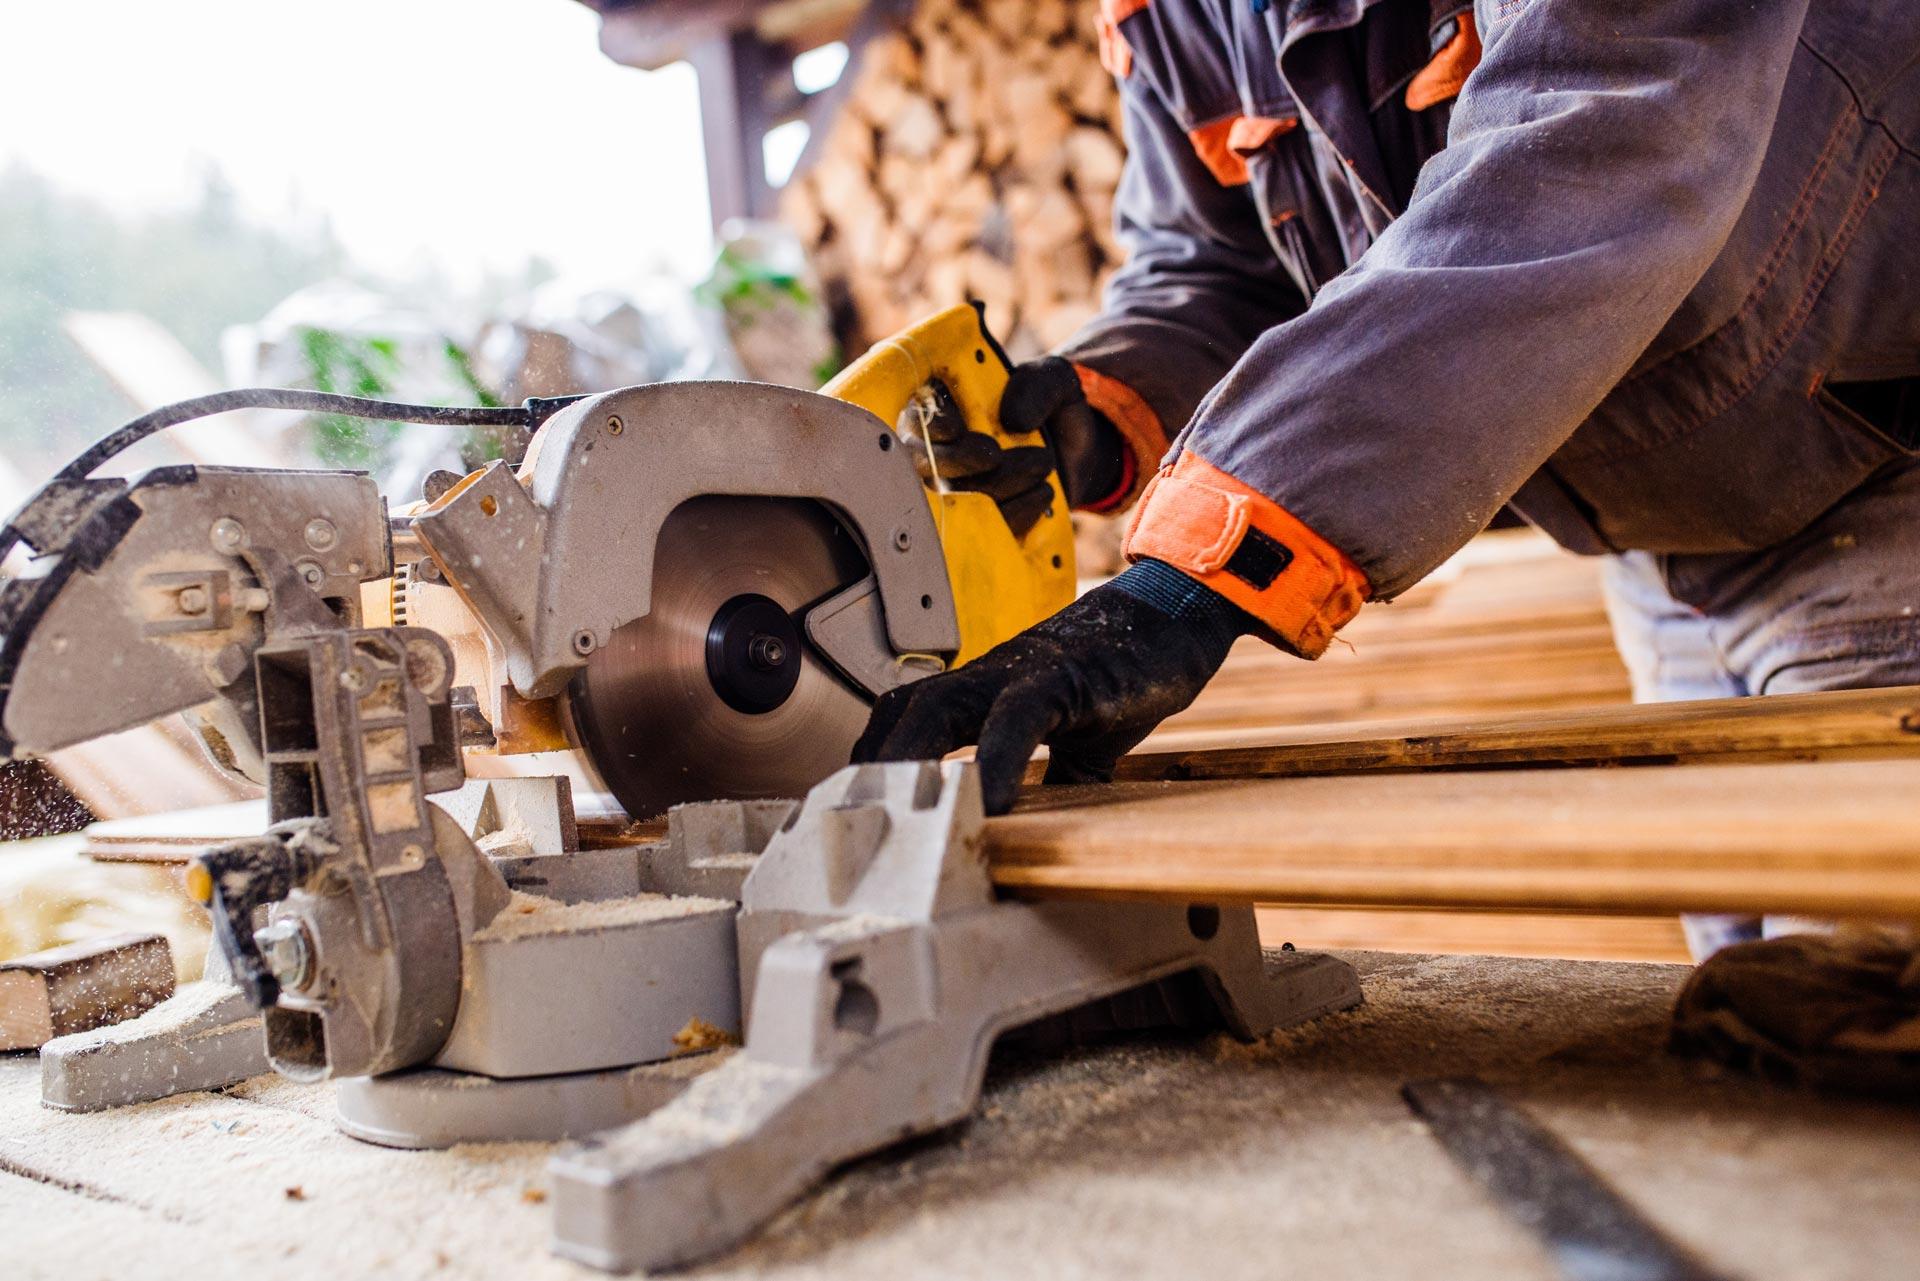 carpintero-cortando-madera-obra